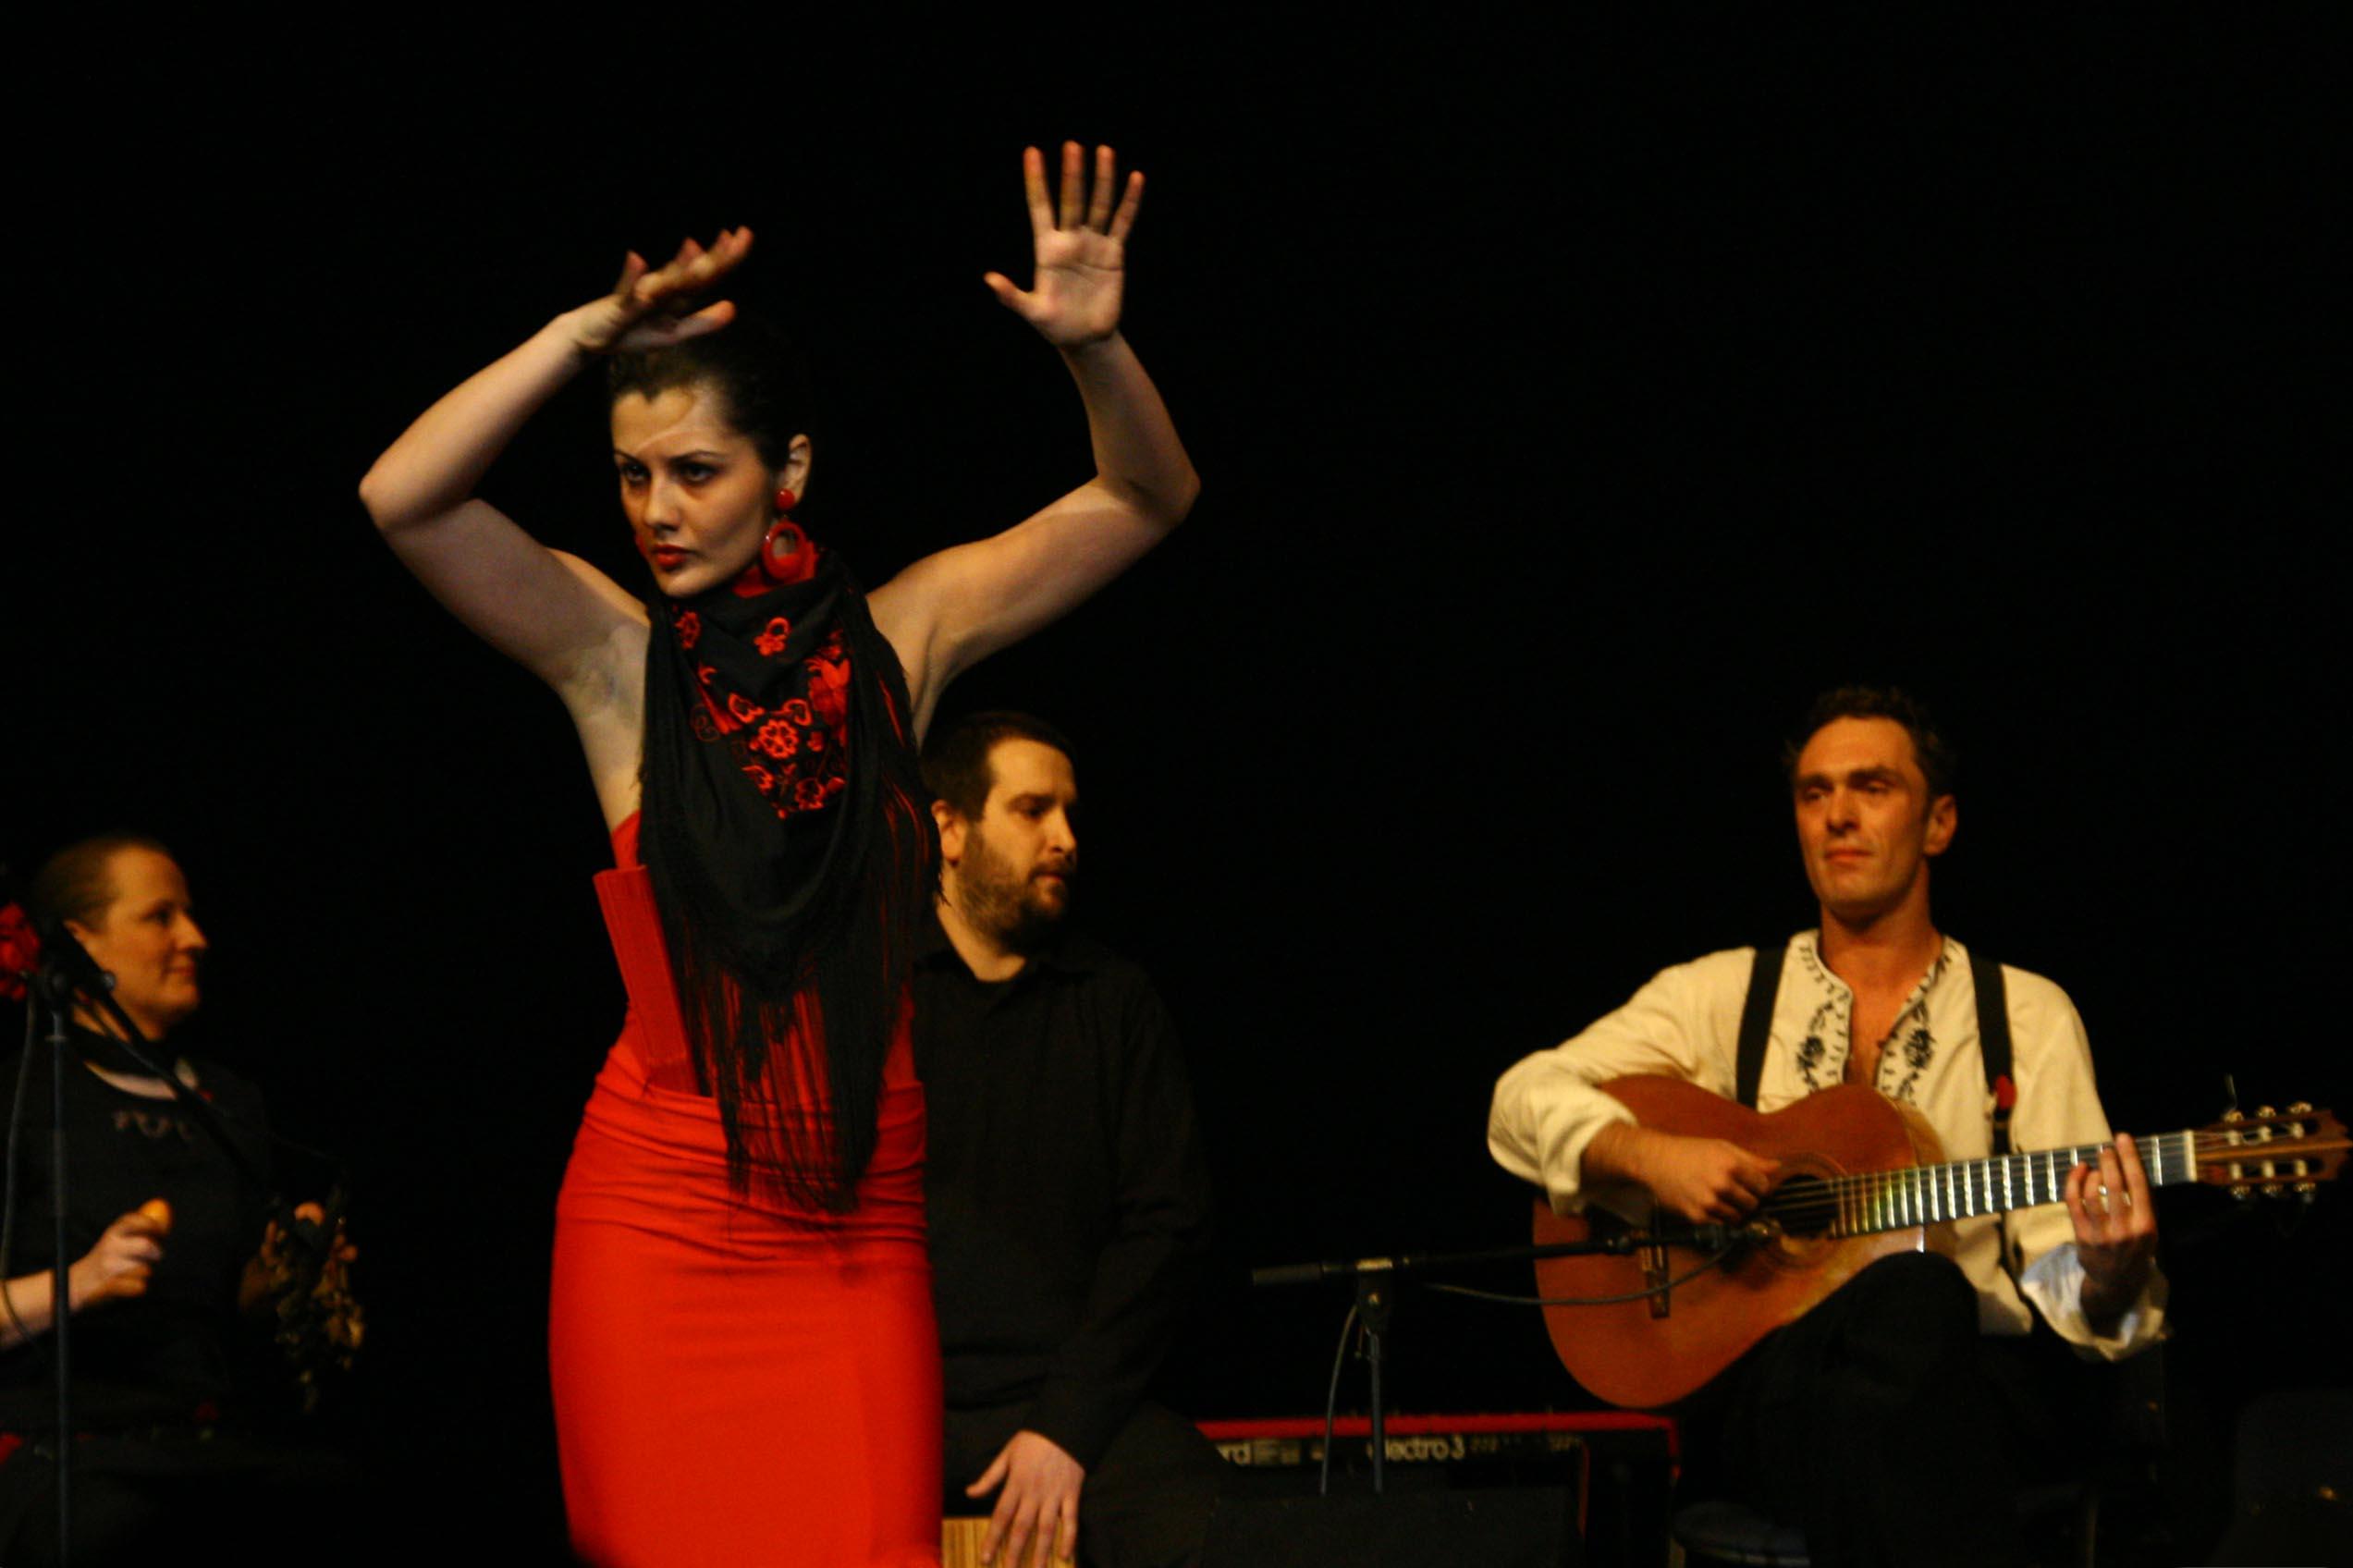 Nicolas - Paco De Lucia Opening Act 2010